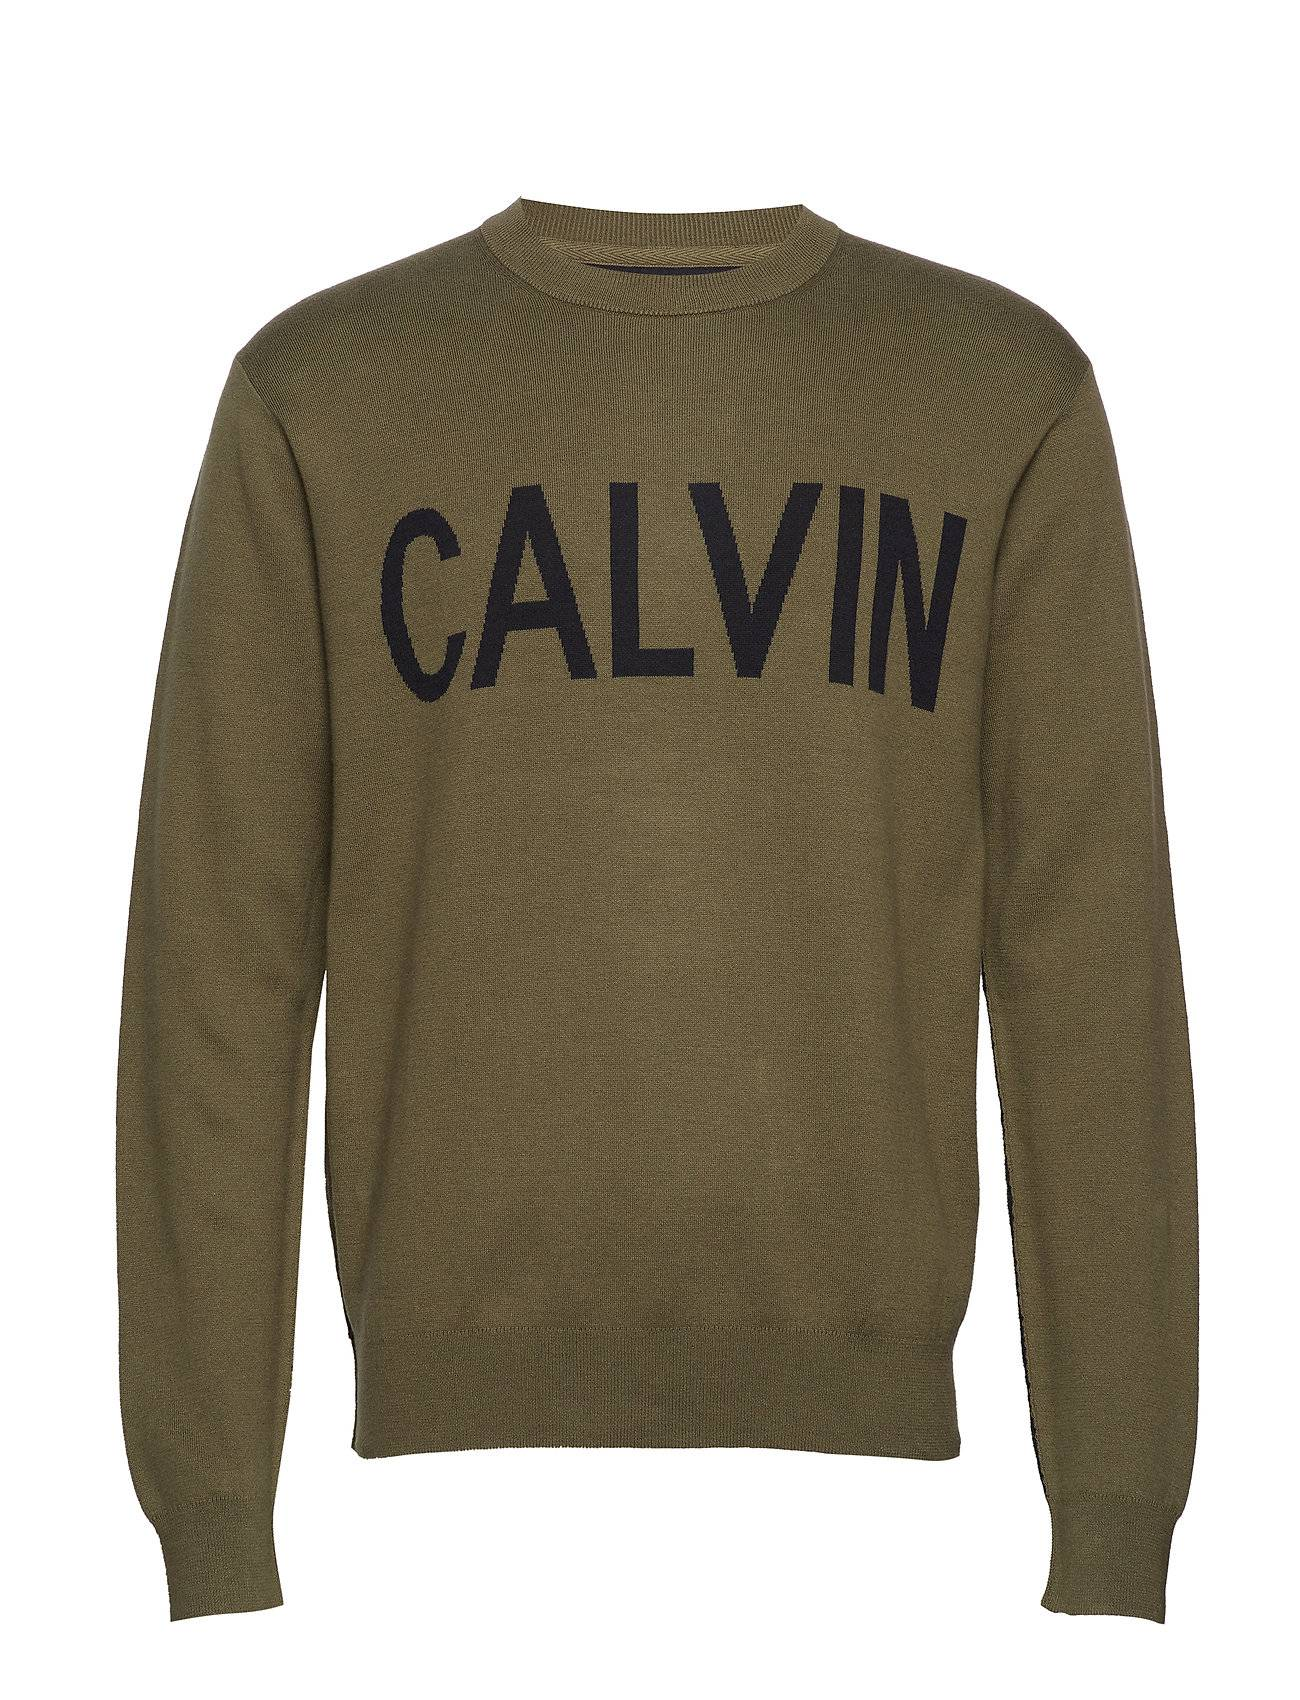 Image of Calvin Cn Sweater Svetari Collegepaita Vihreä Calvin Klein Jeans